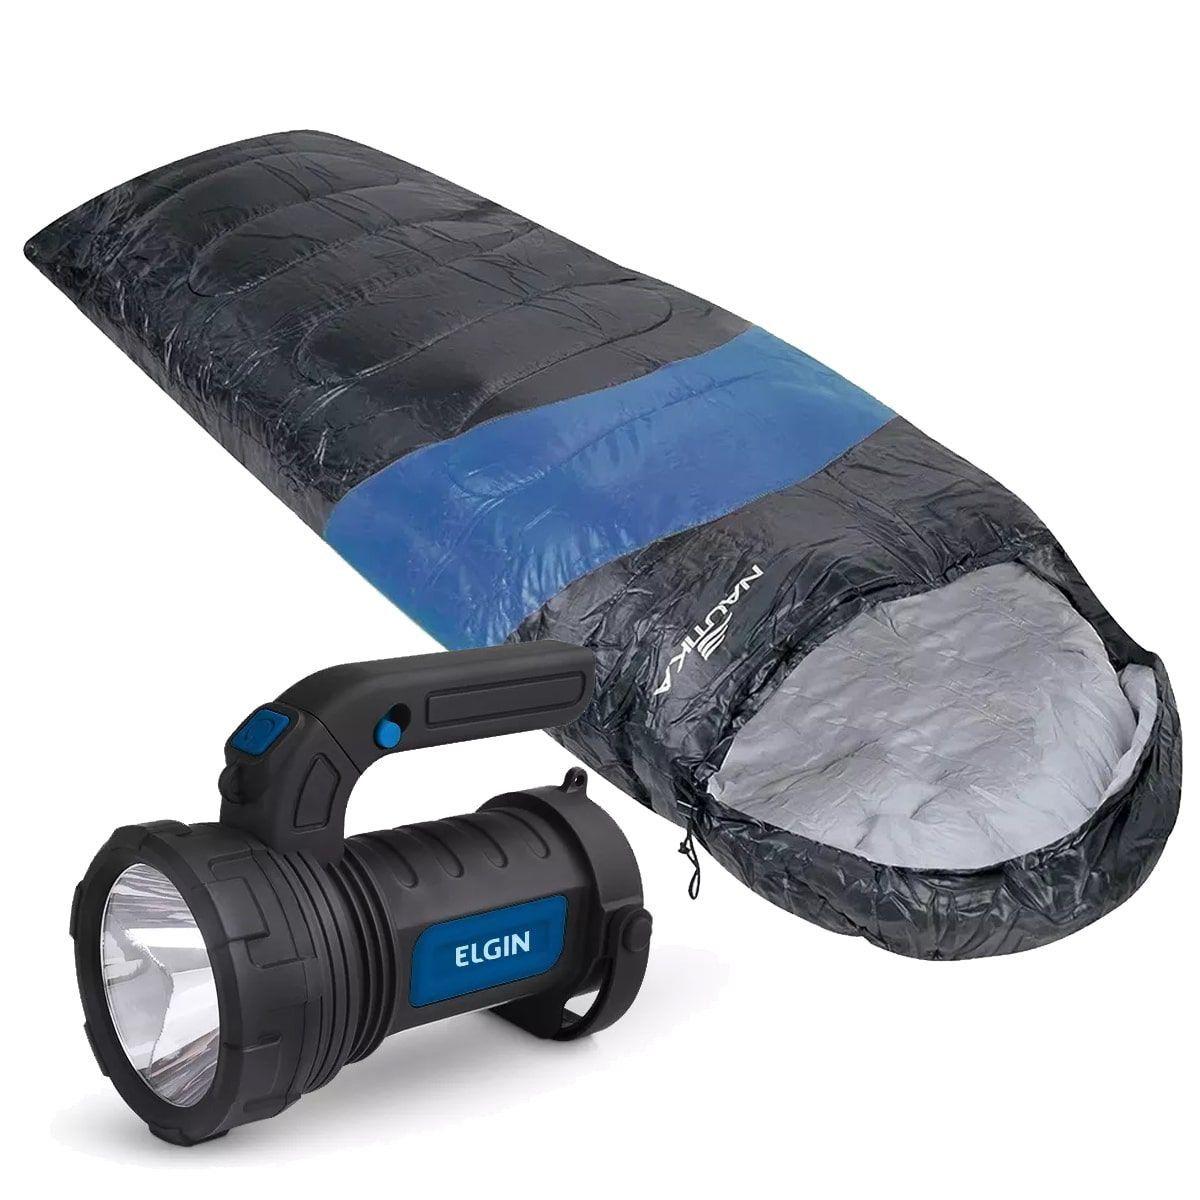 Saco De Dormir Viper Ntk + Lanterna Lampião Elgin